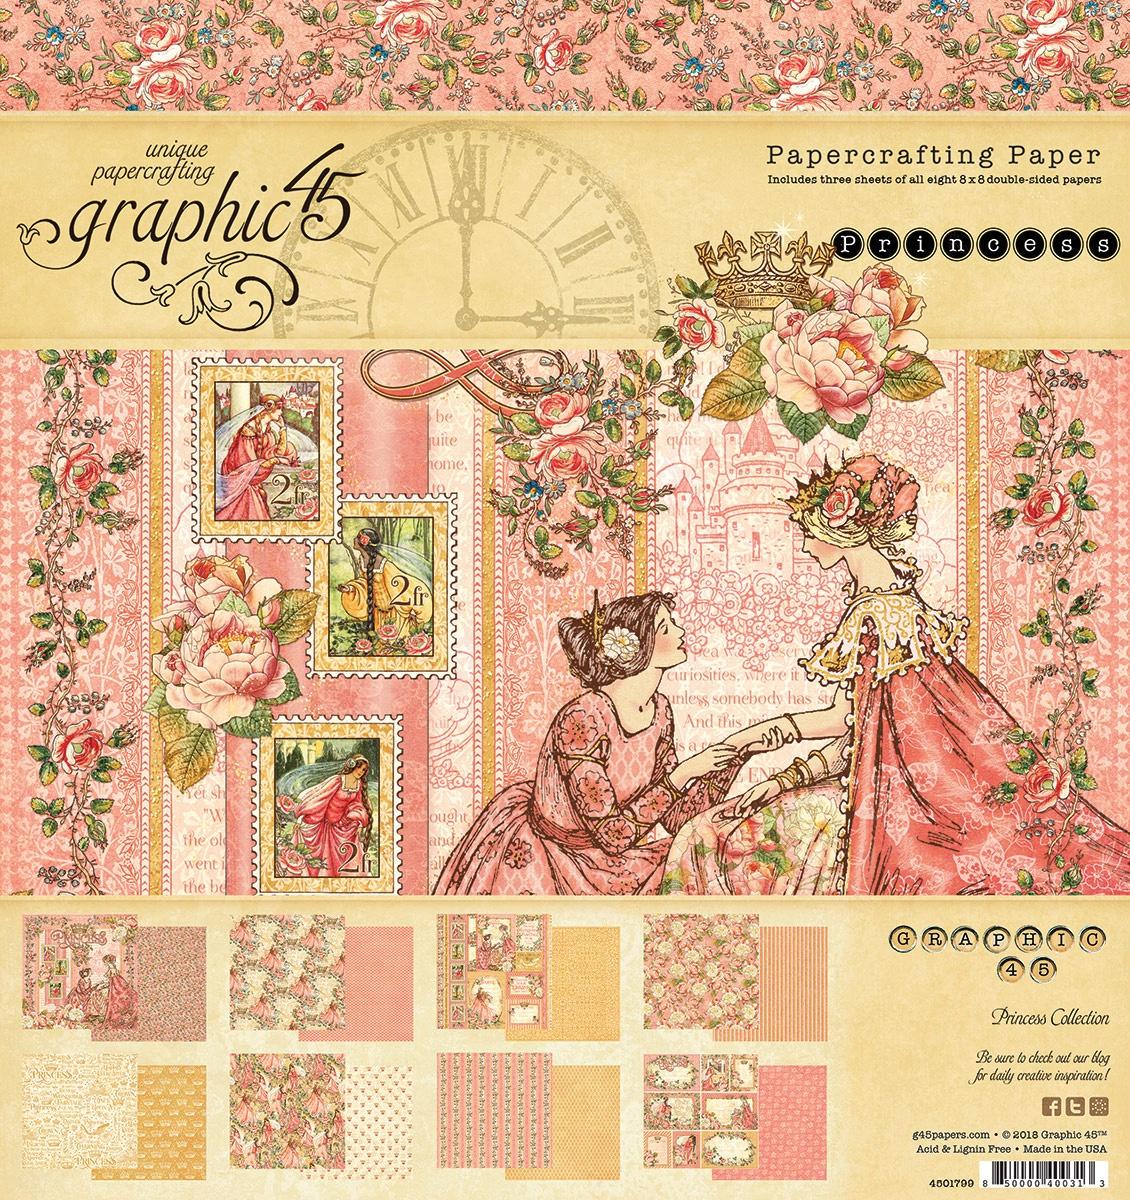 Graphic 45 Double-Sided Paper Pad 8X8 24/Pkg-Princess, 8 Designs/3 Each